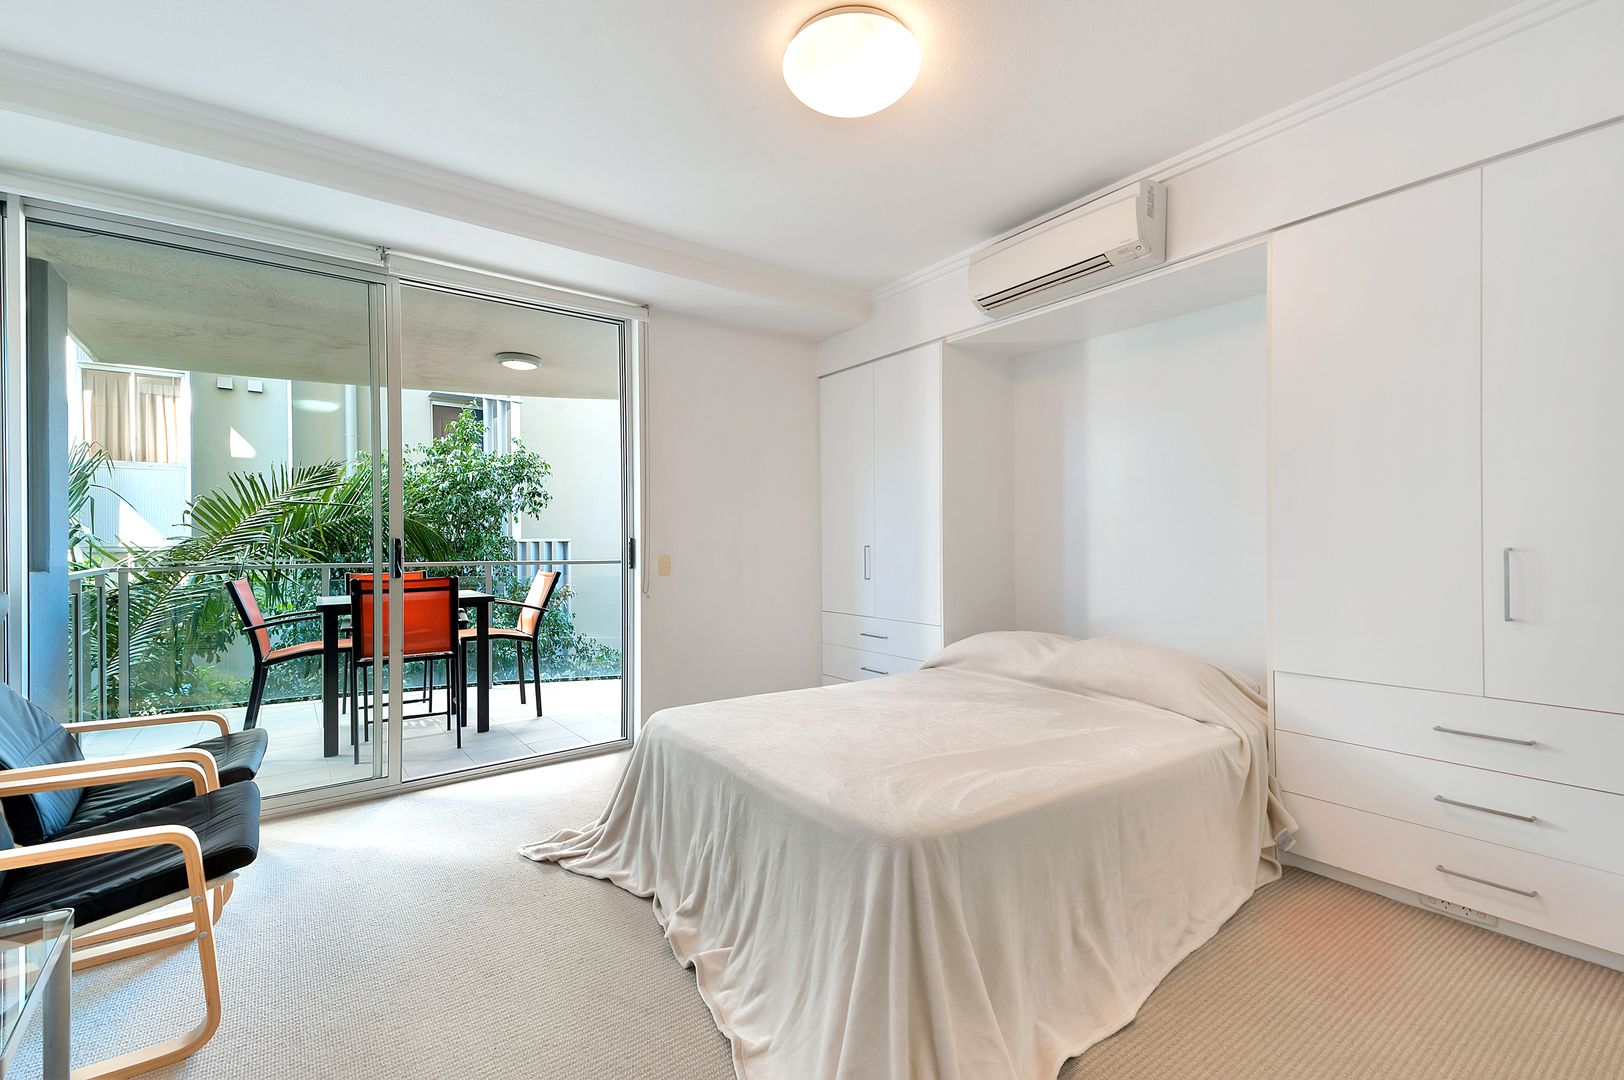 18/62 Cordelia Street, South Brisbane QLD 4101, Image 1